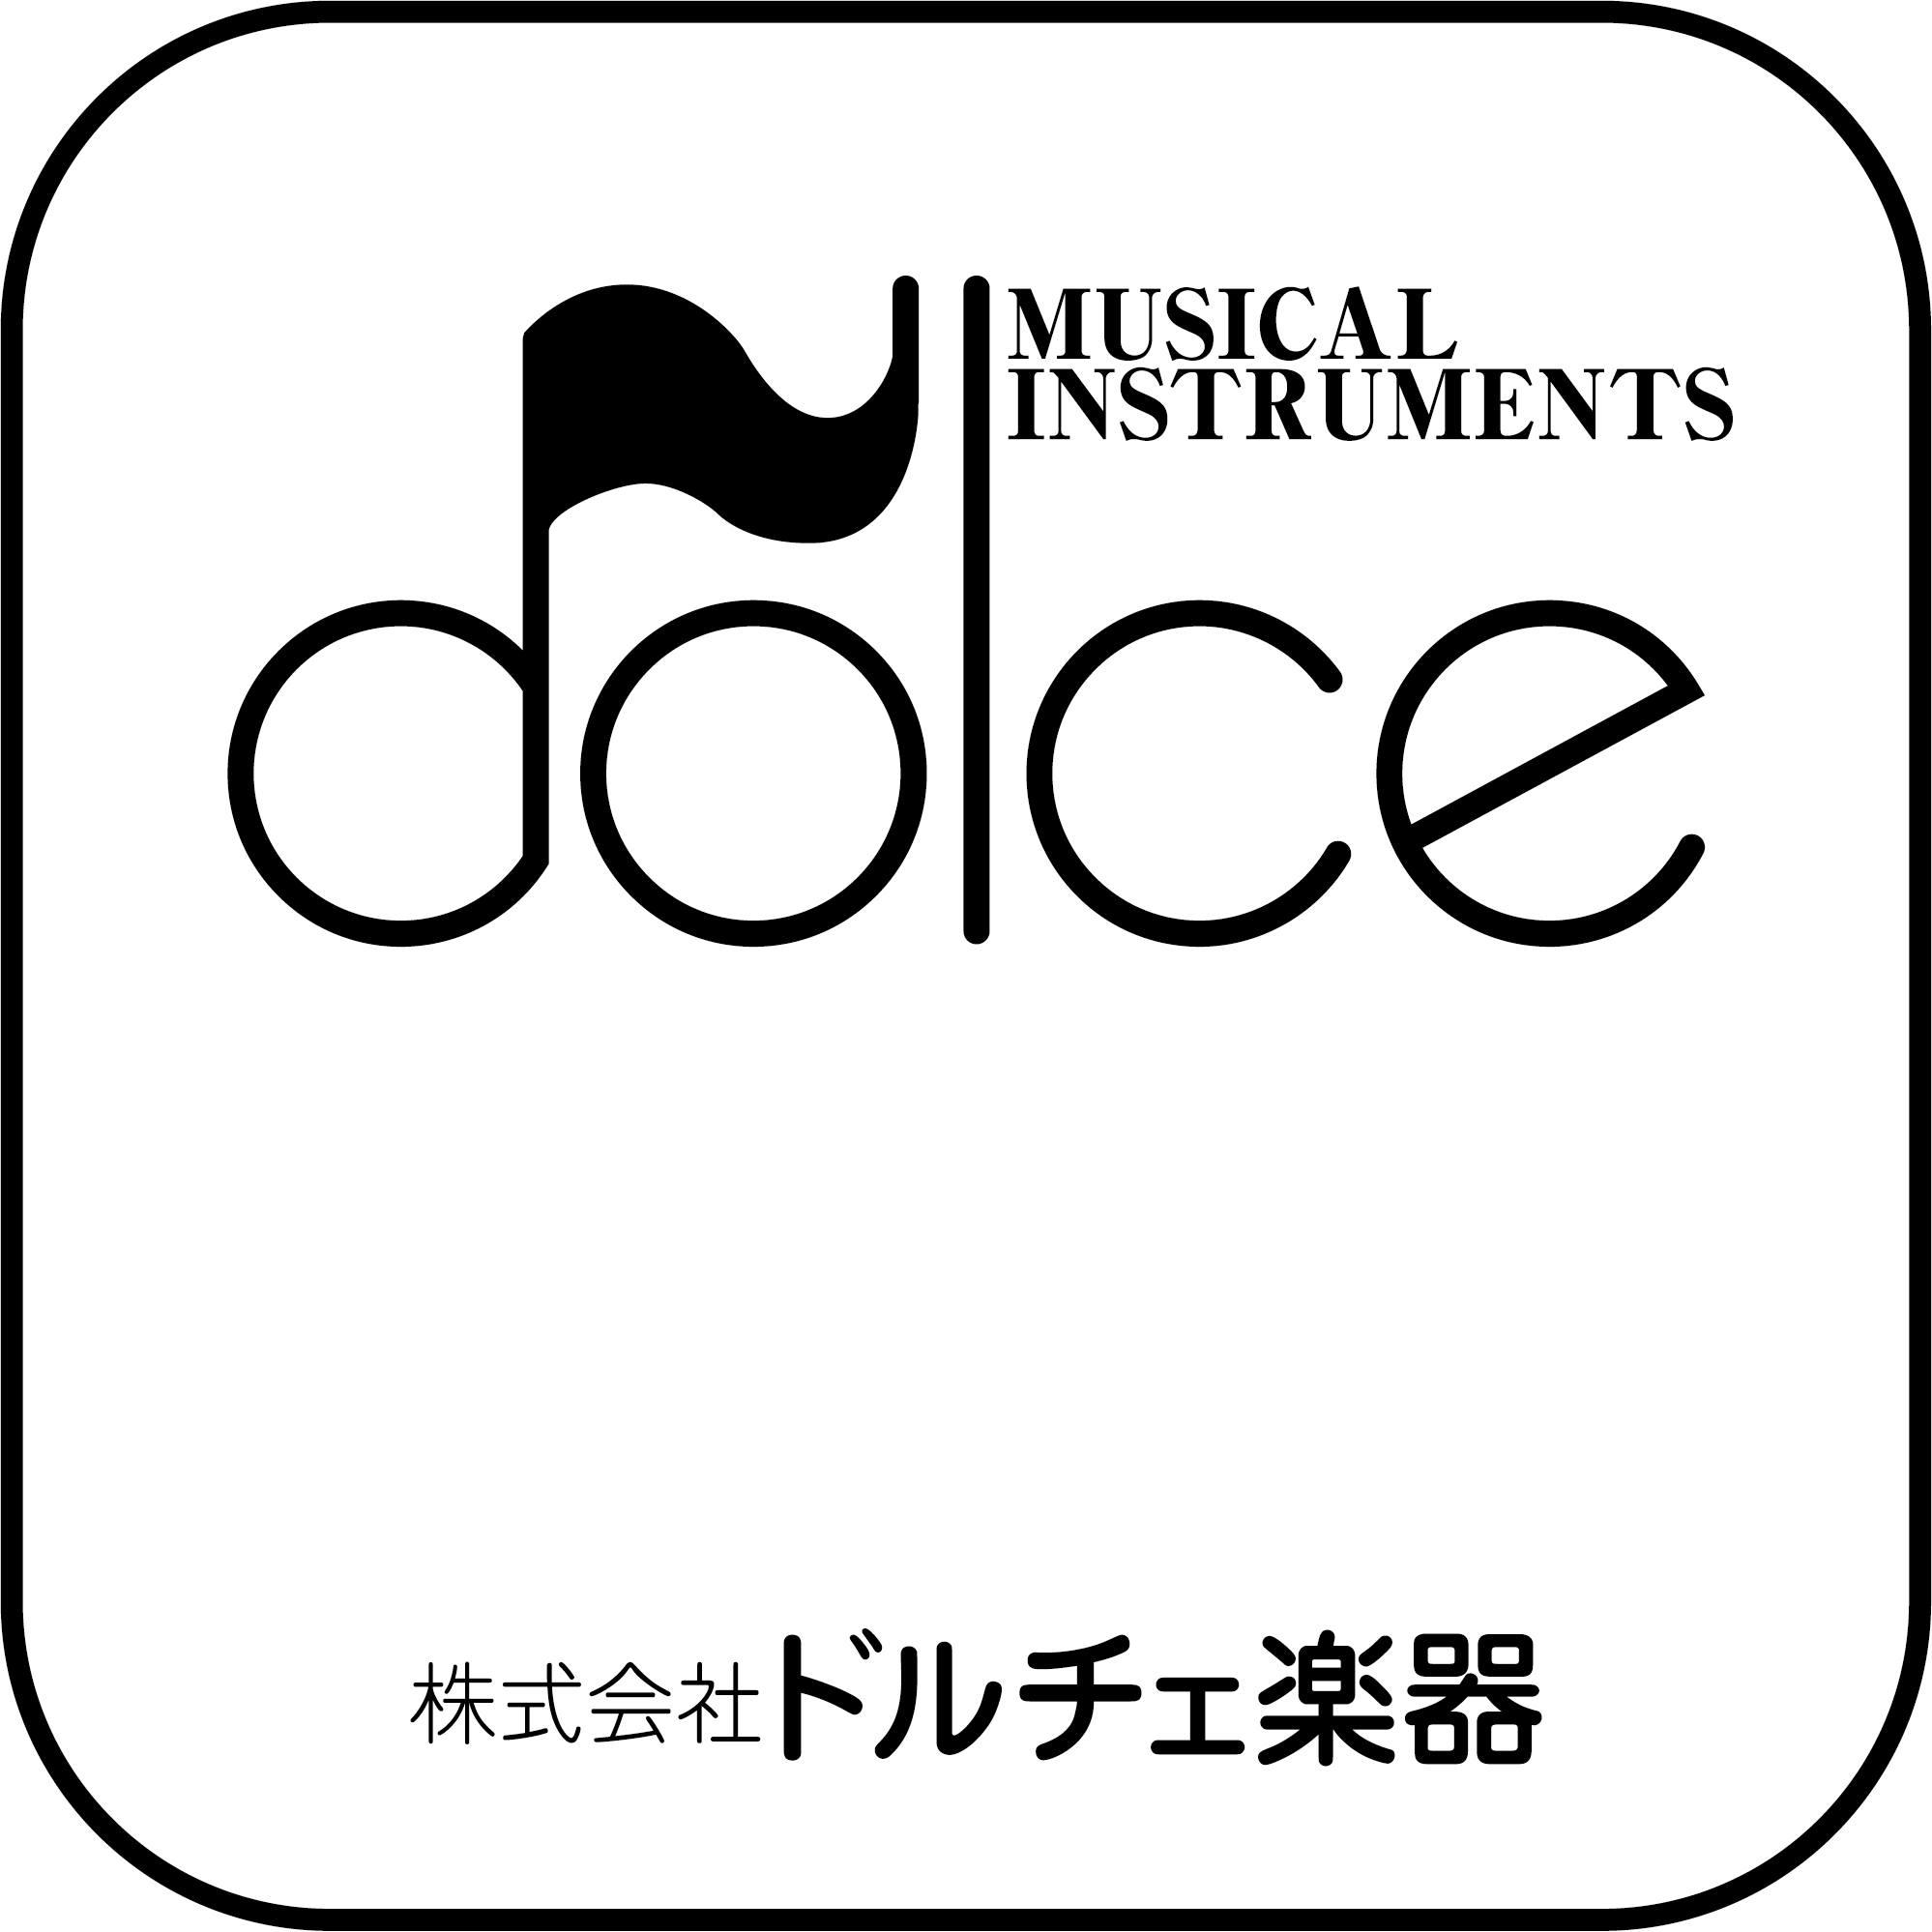 Dolce Musical Instruments - Osaka  Custom & Q Series